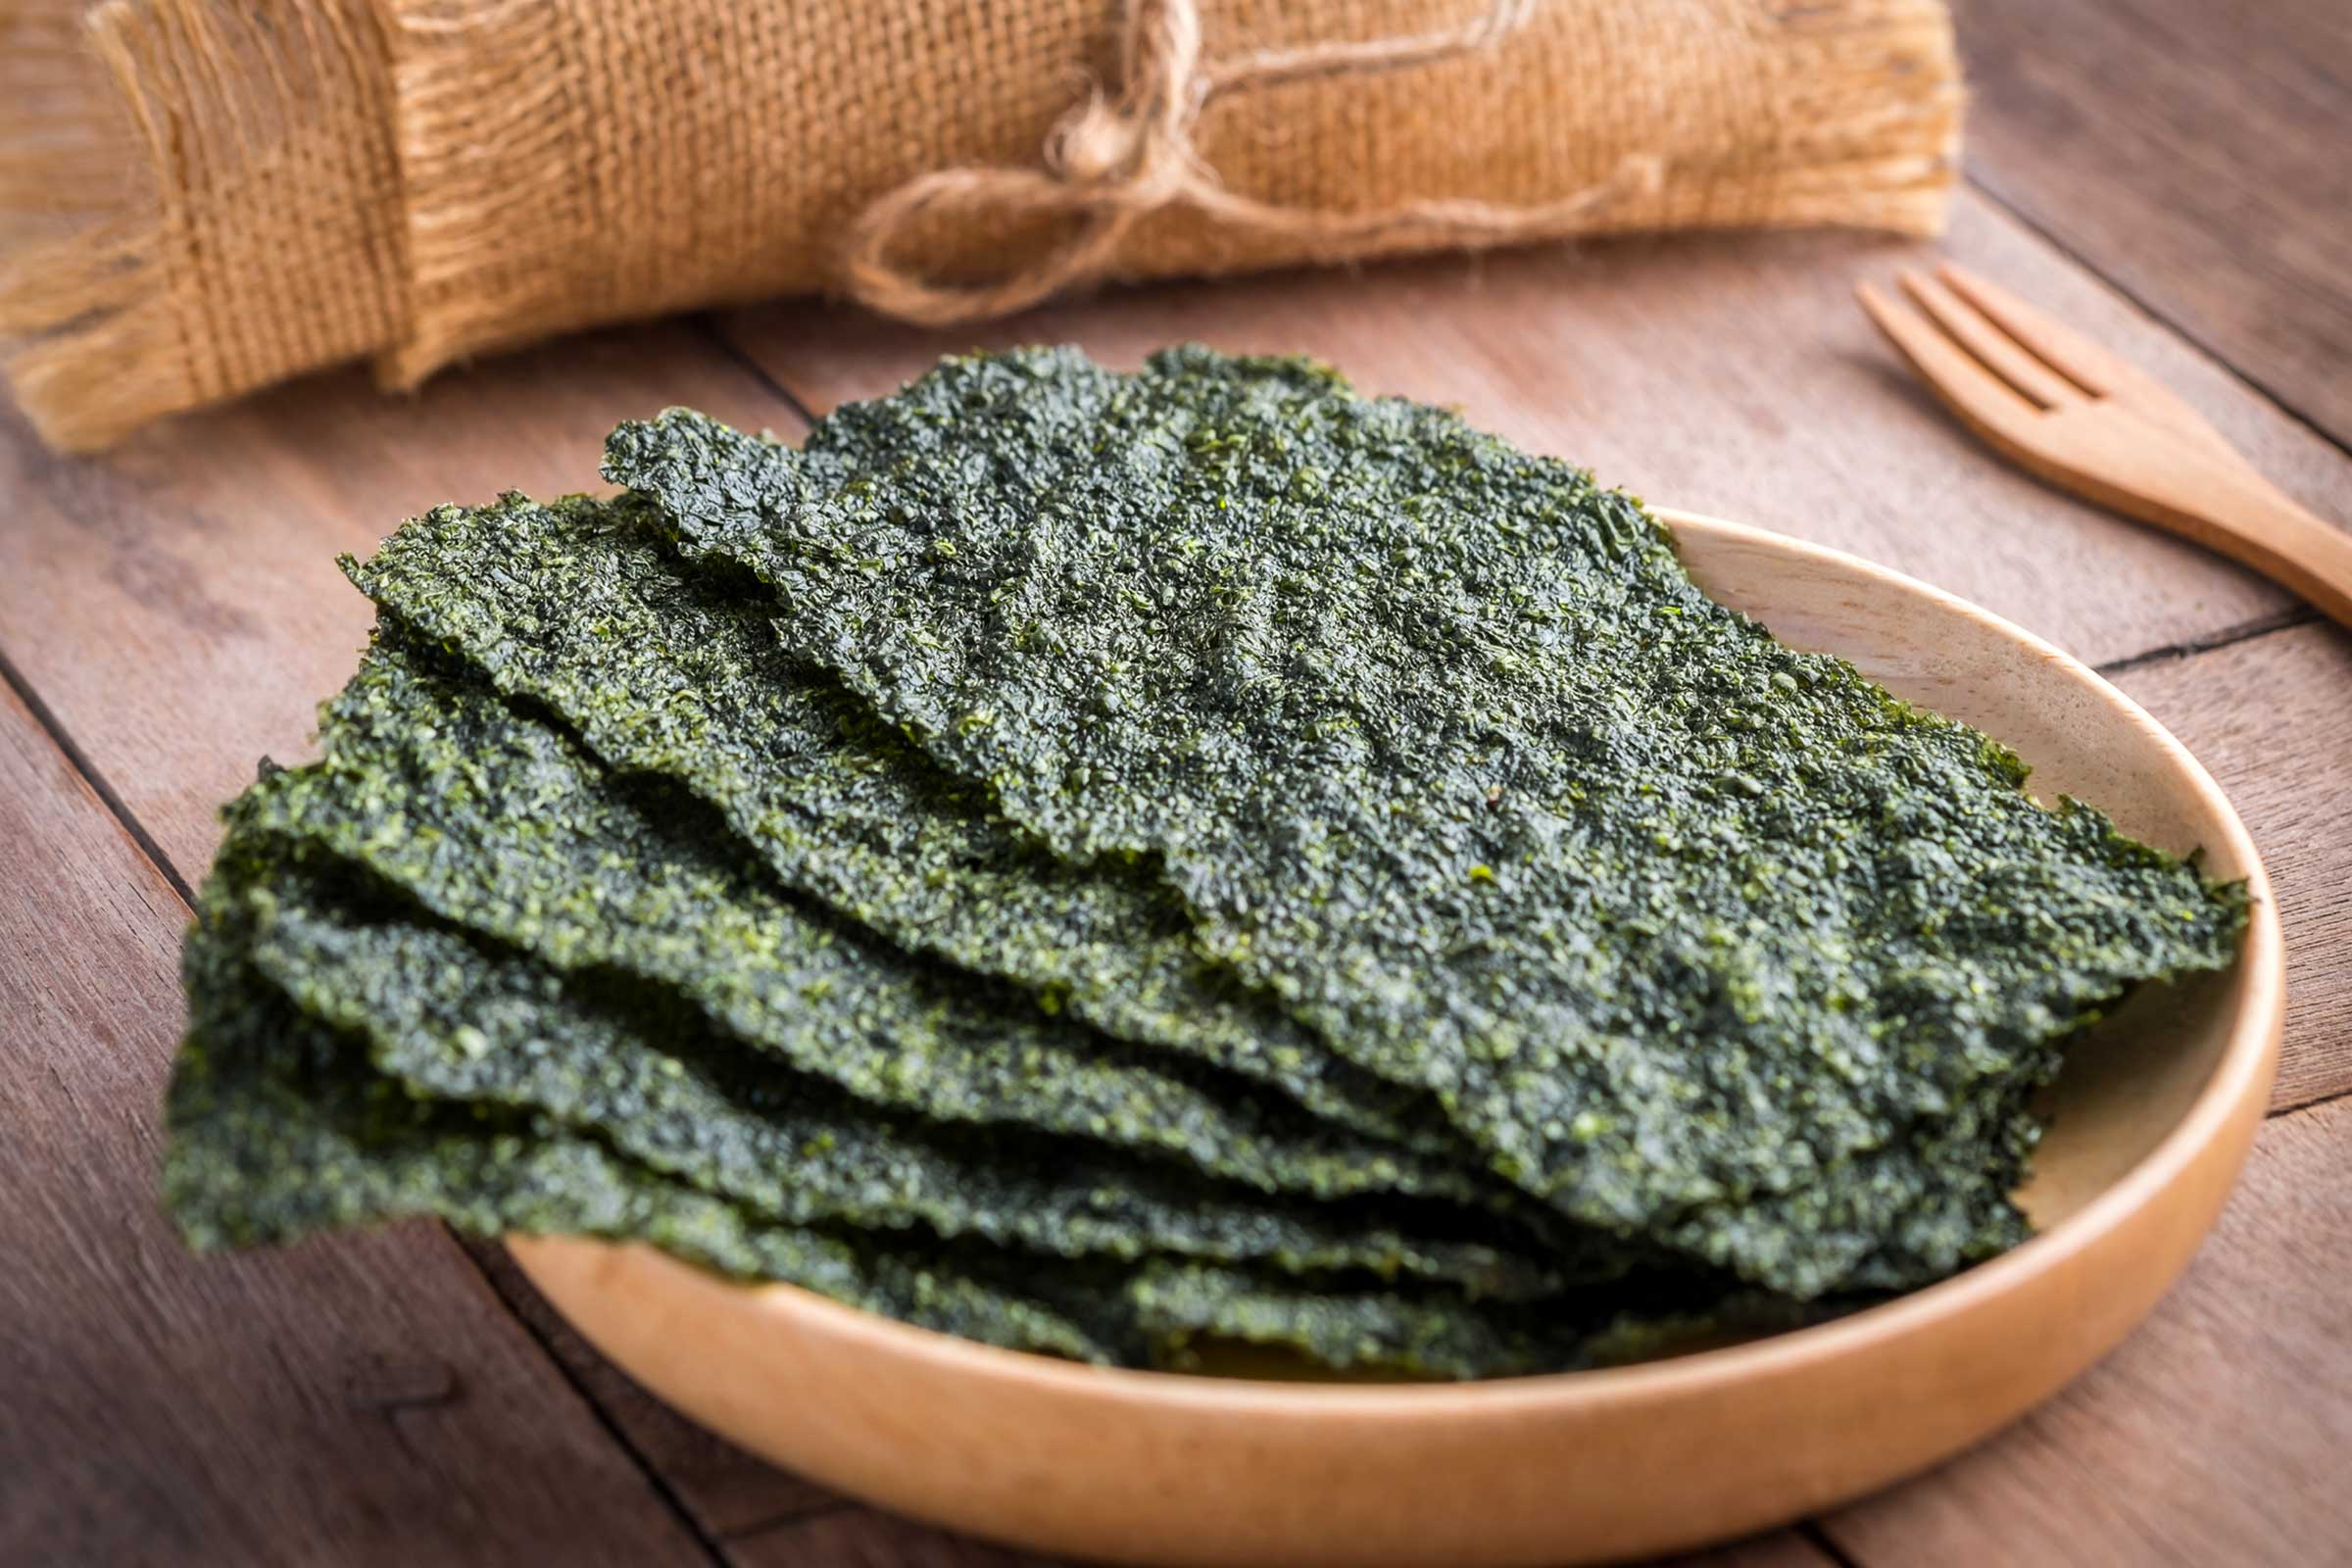 Seaweed photo